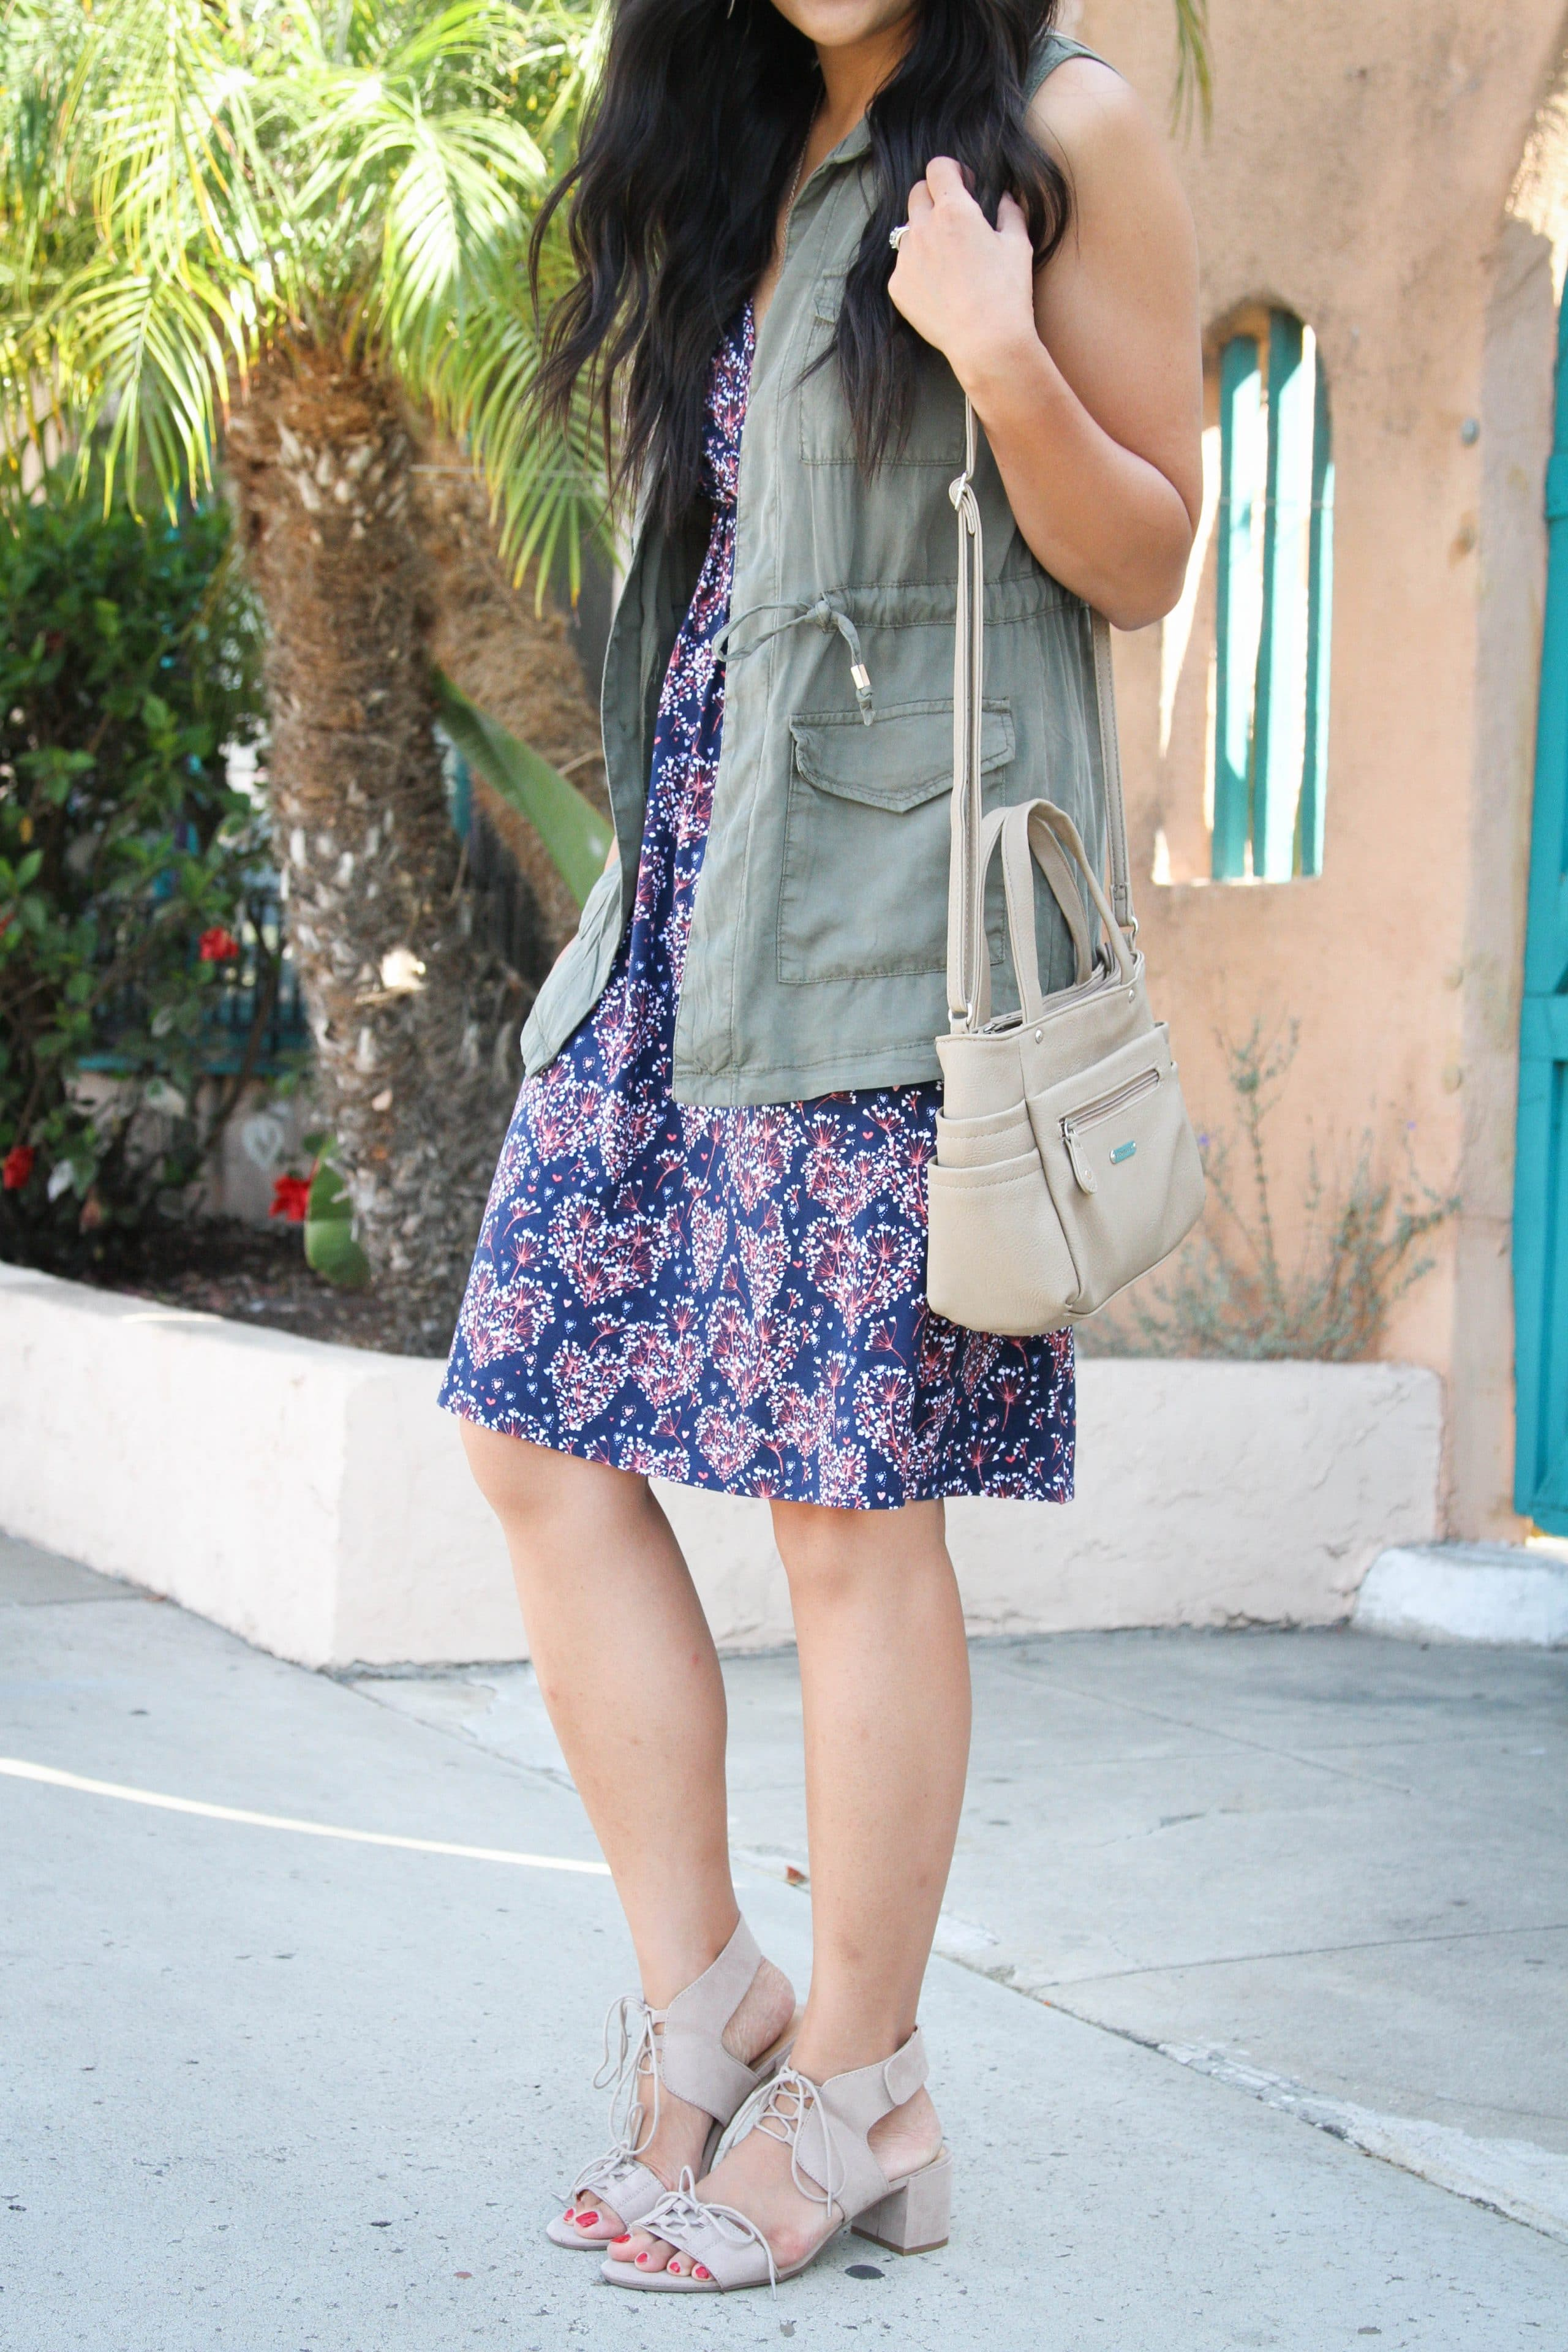 a577ba240bfc ... Utility Vest + White Necklace + Tan Bag Block Sandals + Green Vest +  Blue printed Dress + Tan Bag ...